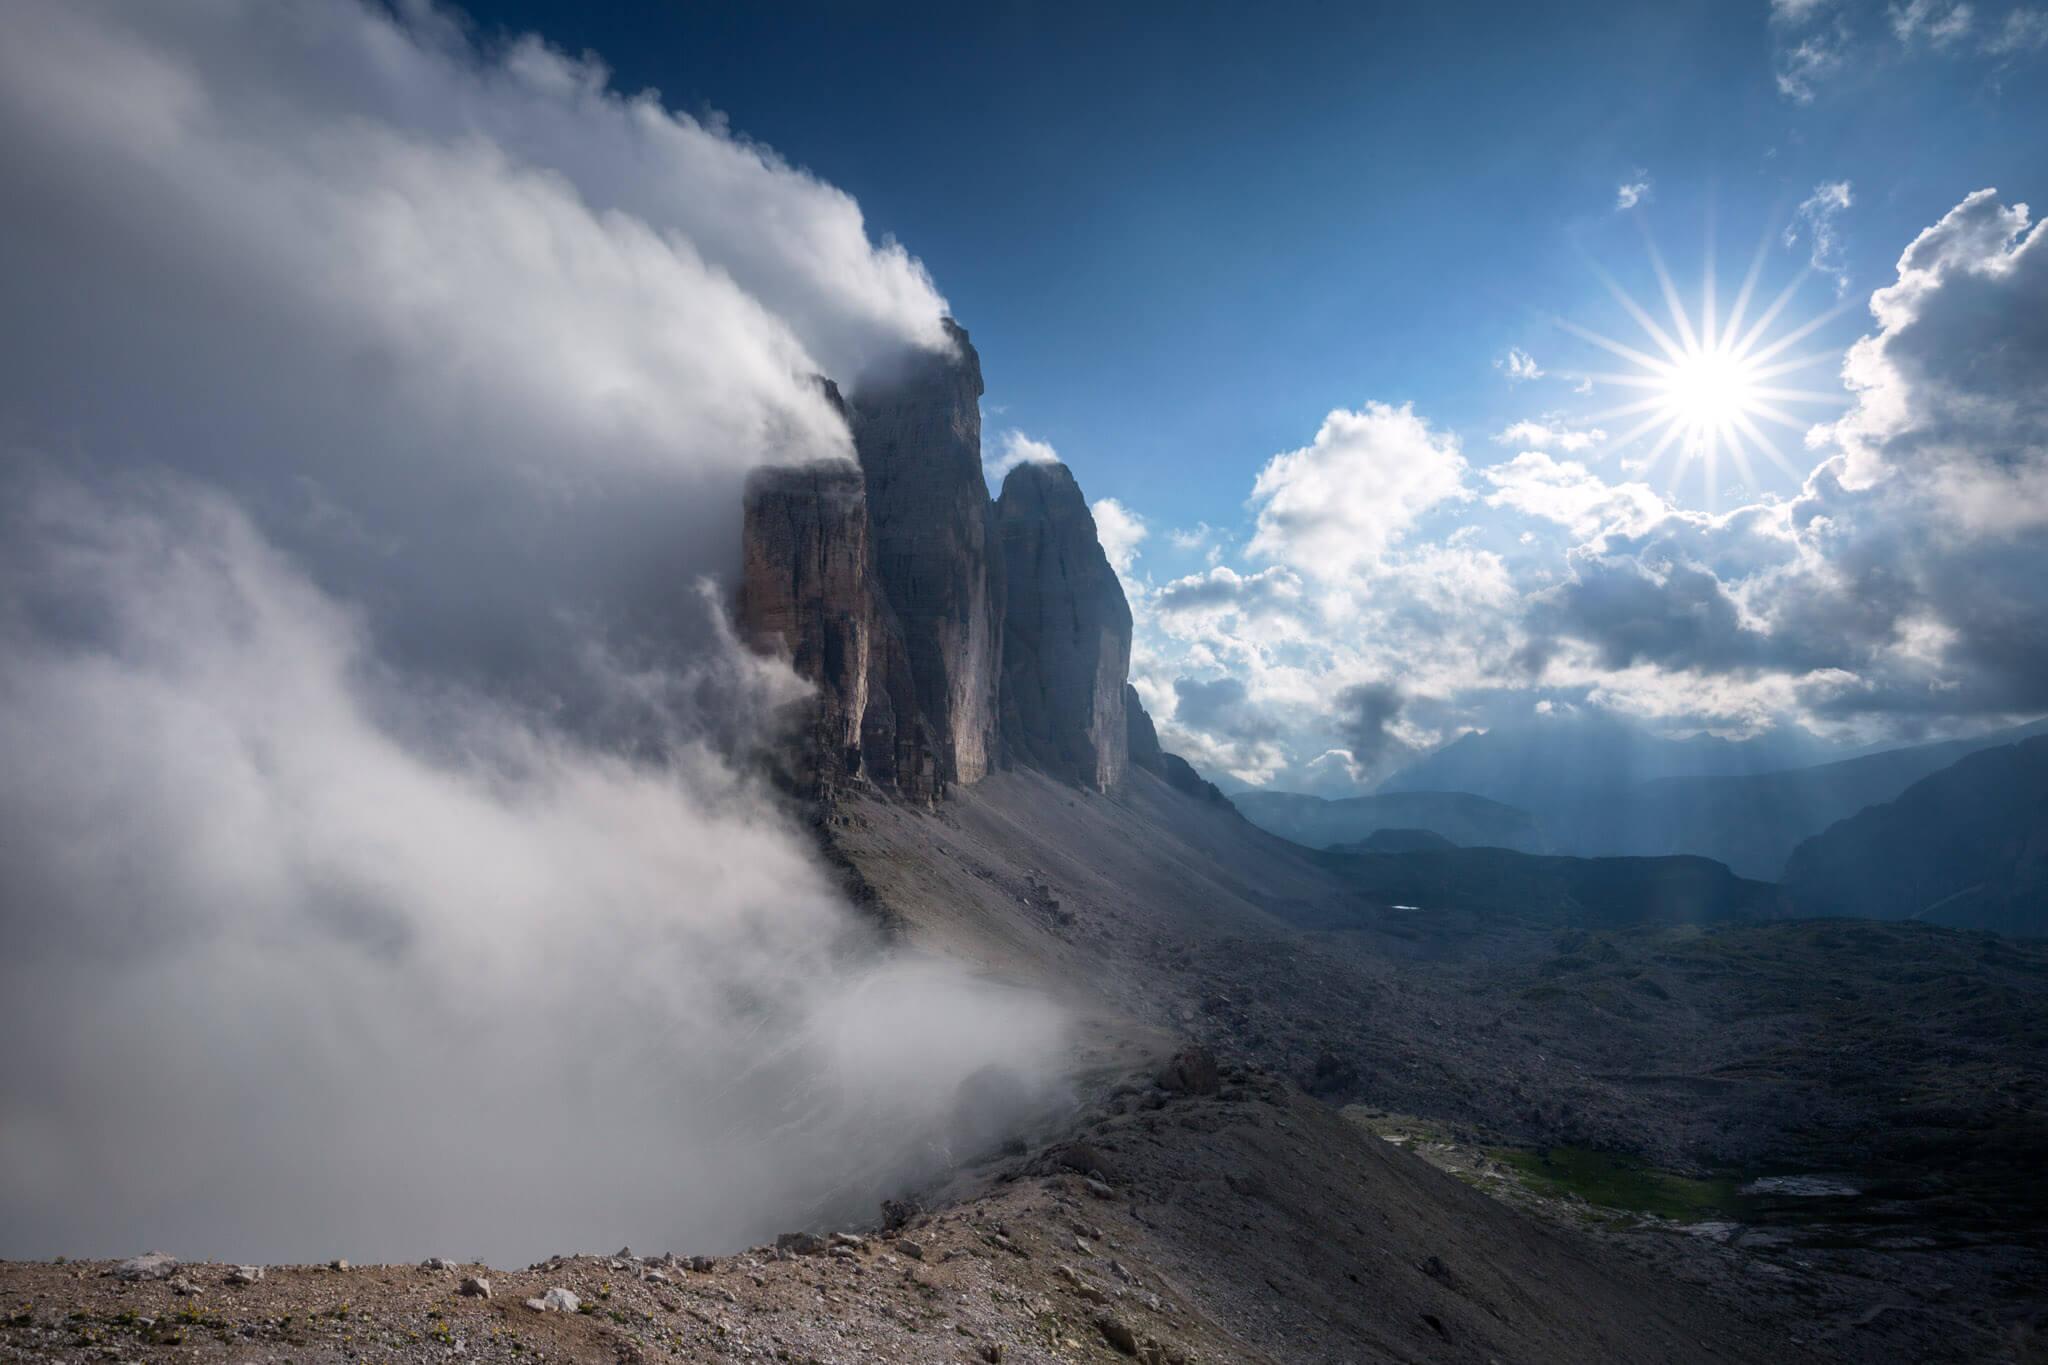 Fog around Tre Cime di Lavaredo in the Dolomites